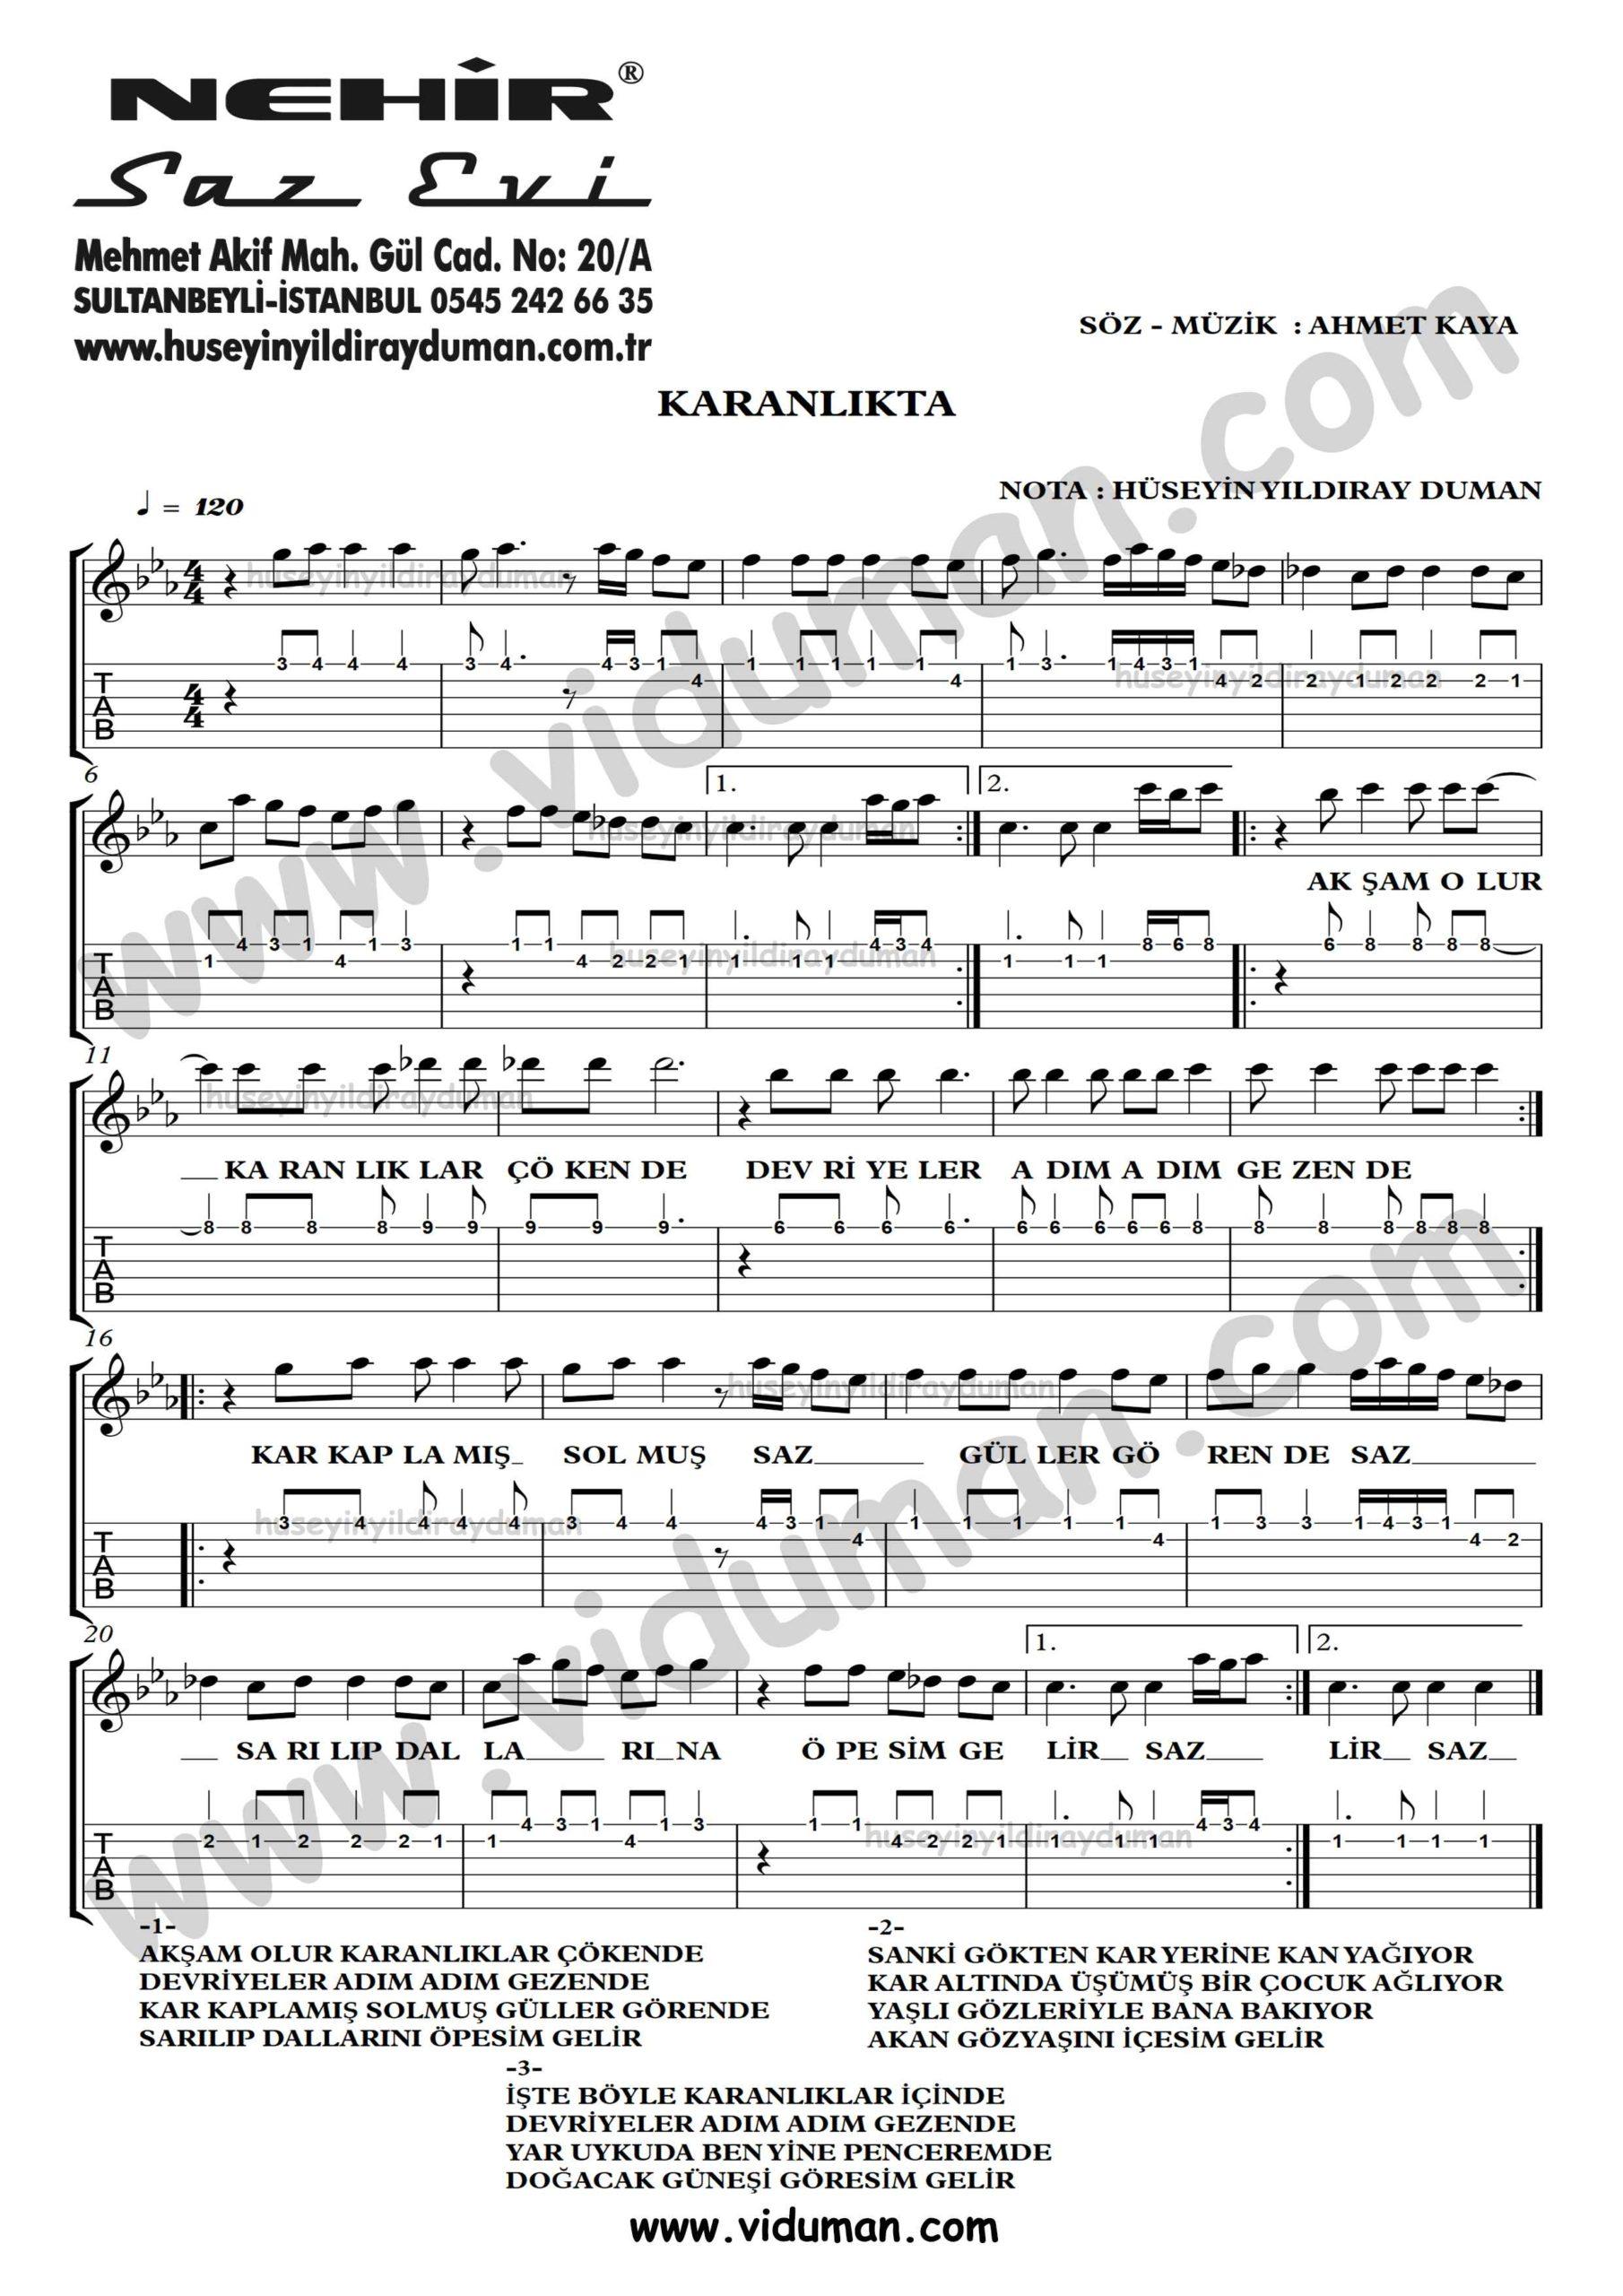 Karanlikta-Ahmet Kaya-Gitar Tab-Solo Notalari